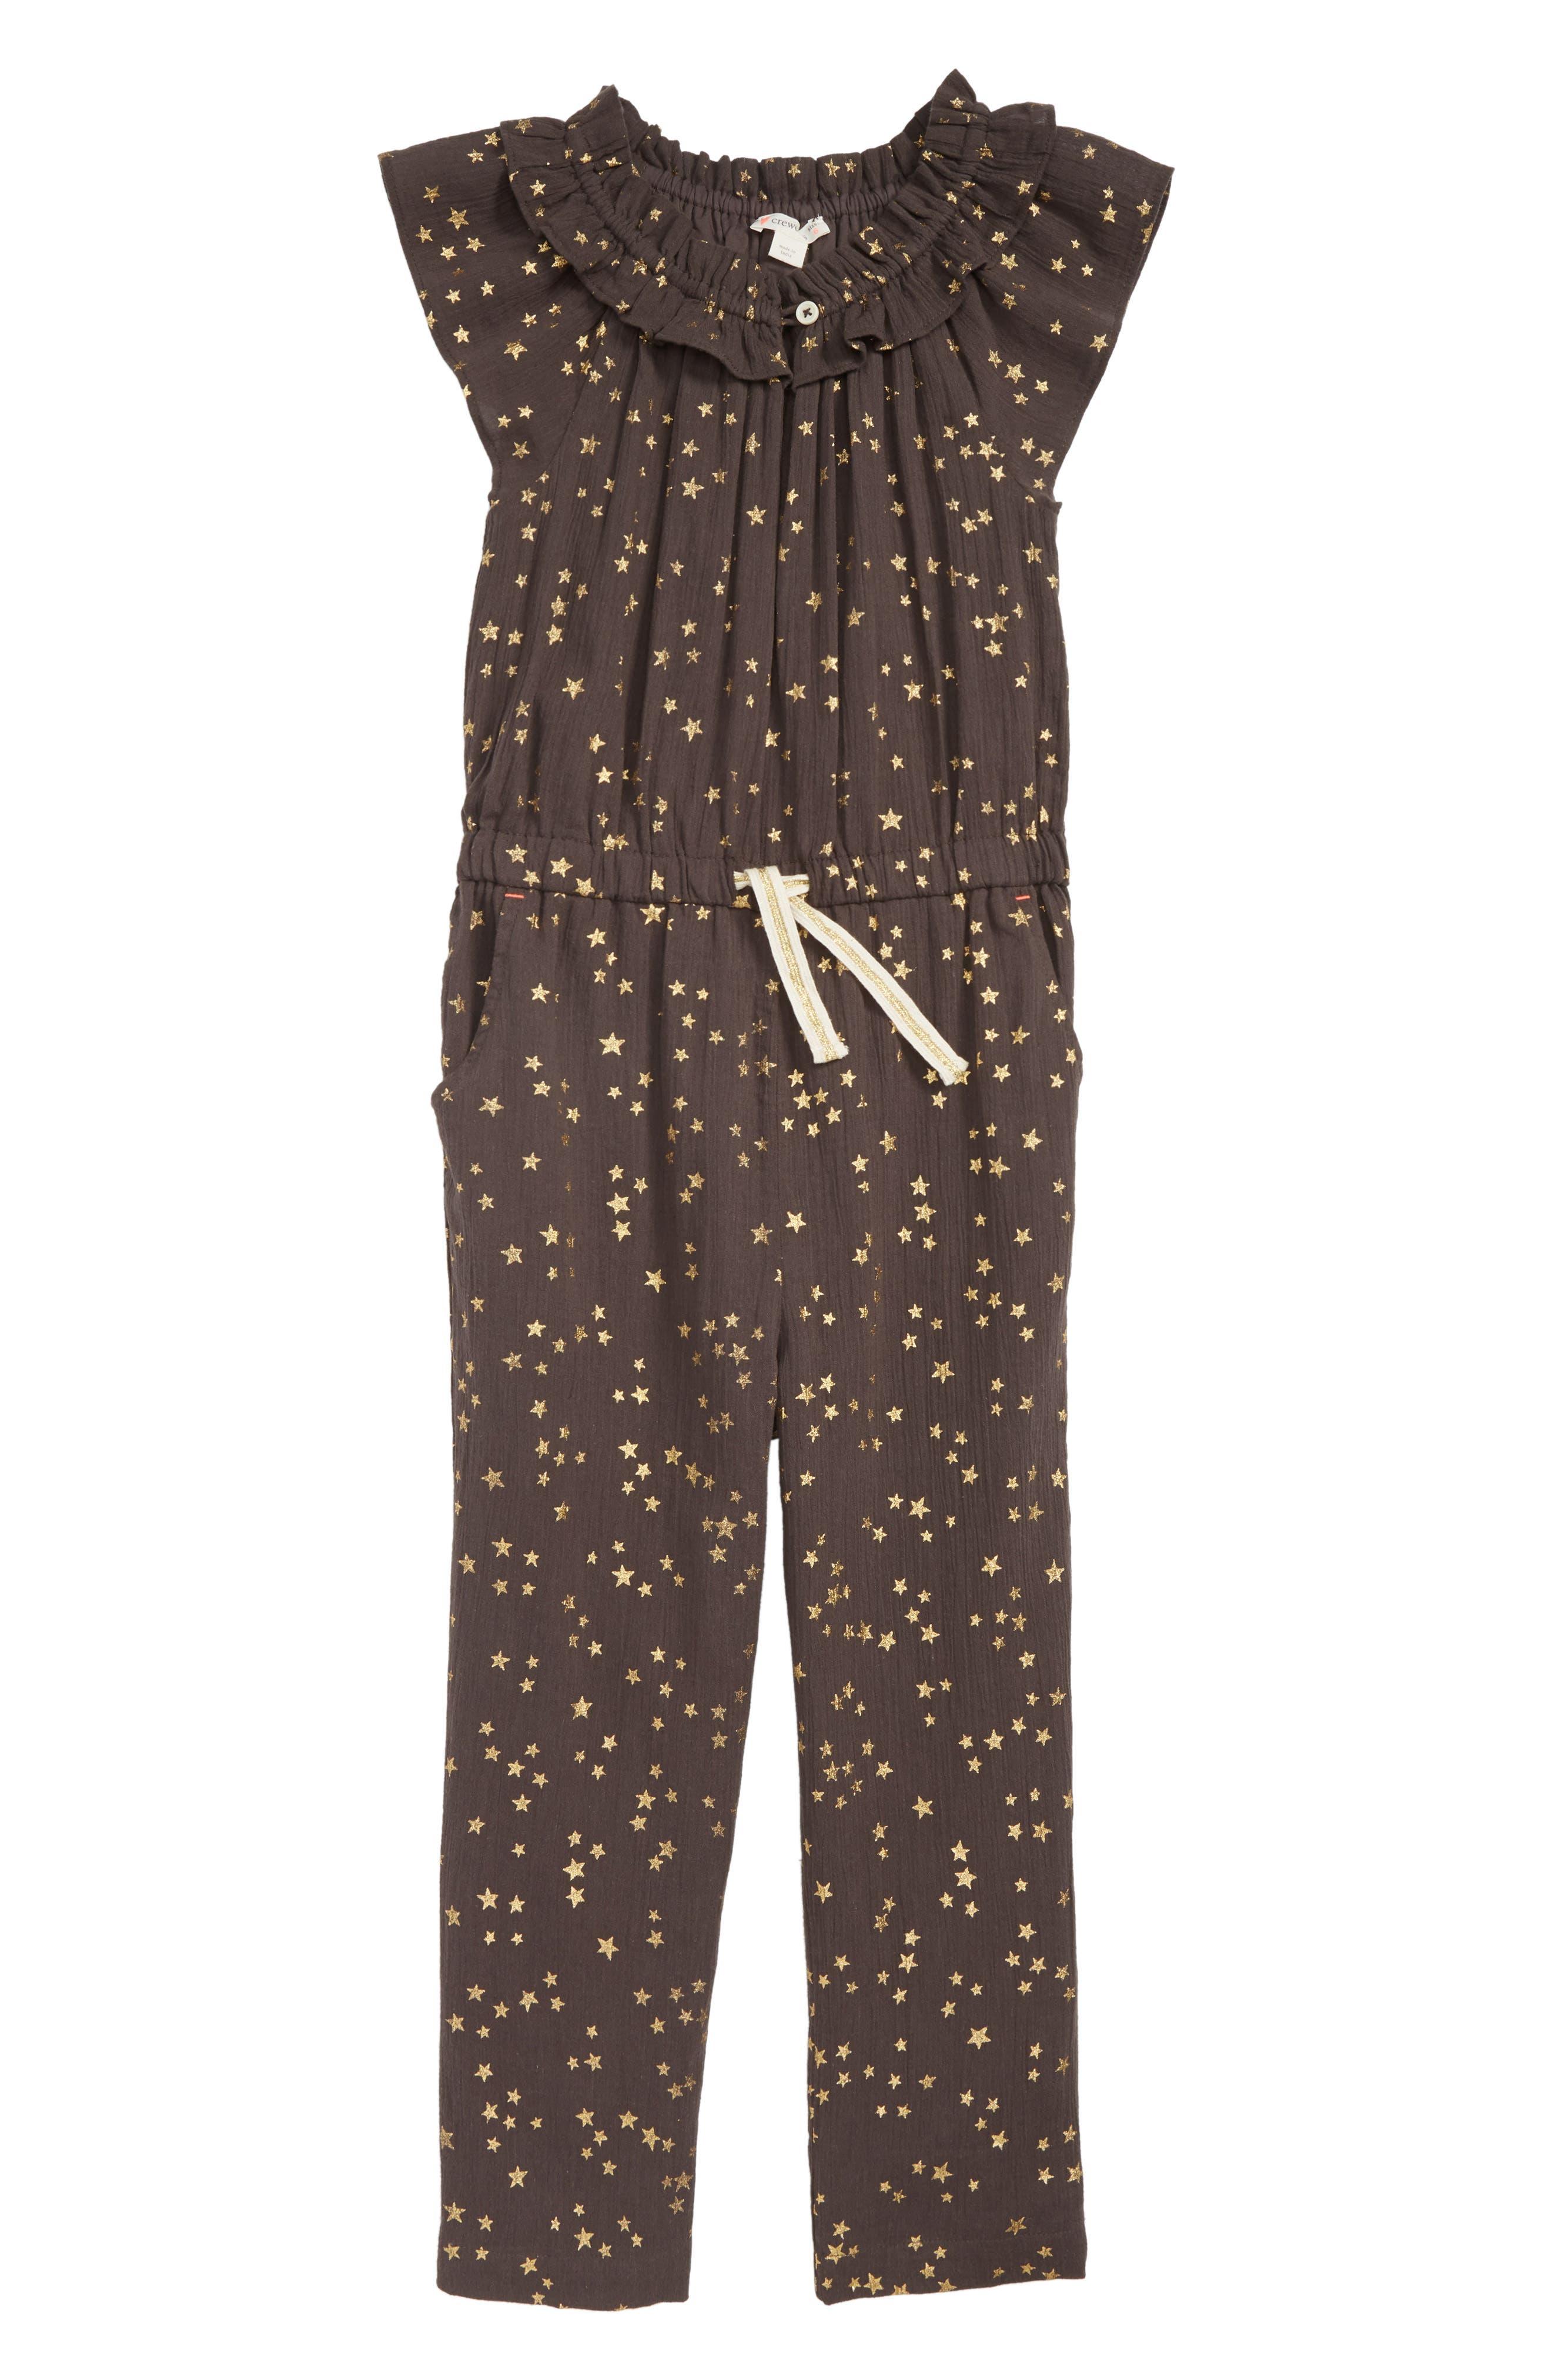 Girls Crewcuts By Jcrew Star Jumpsuit Size 14  Brown